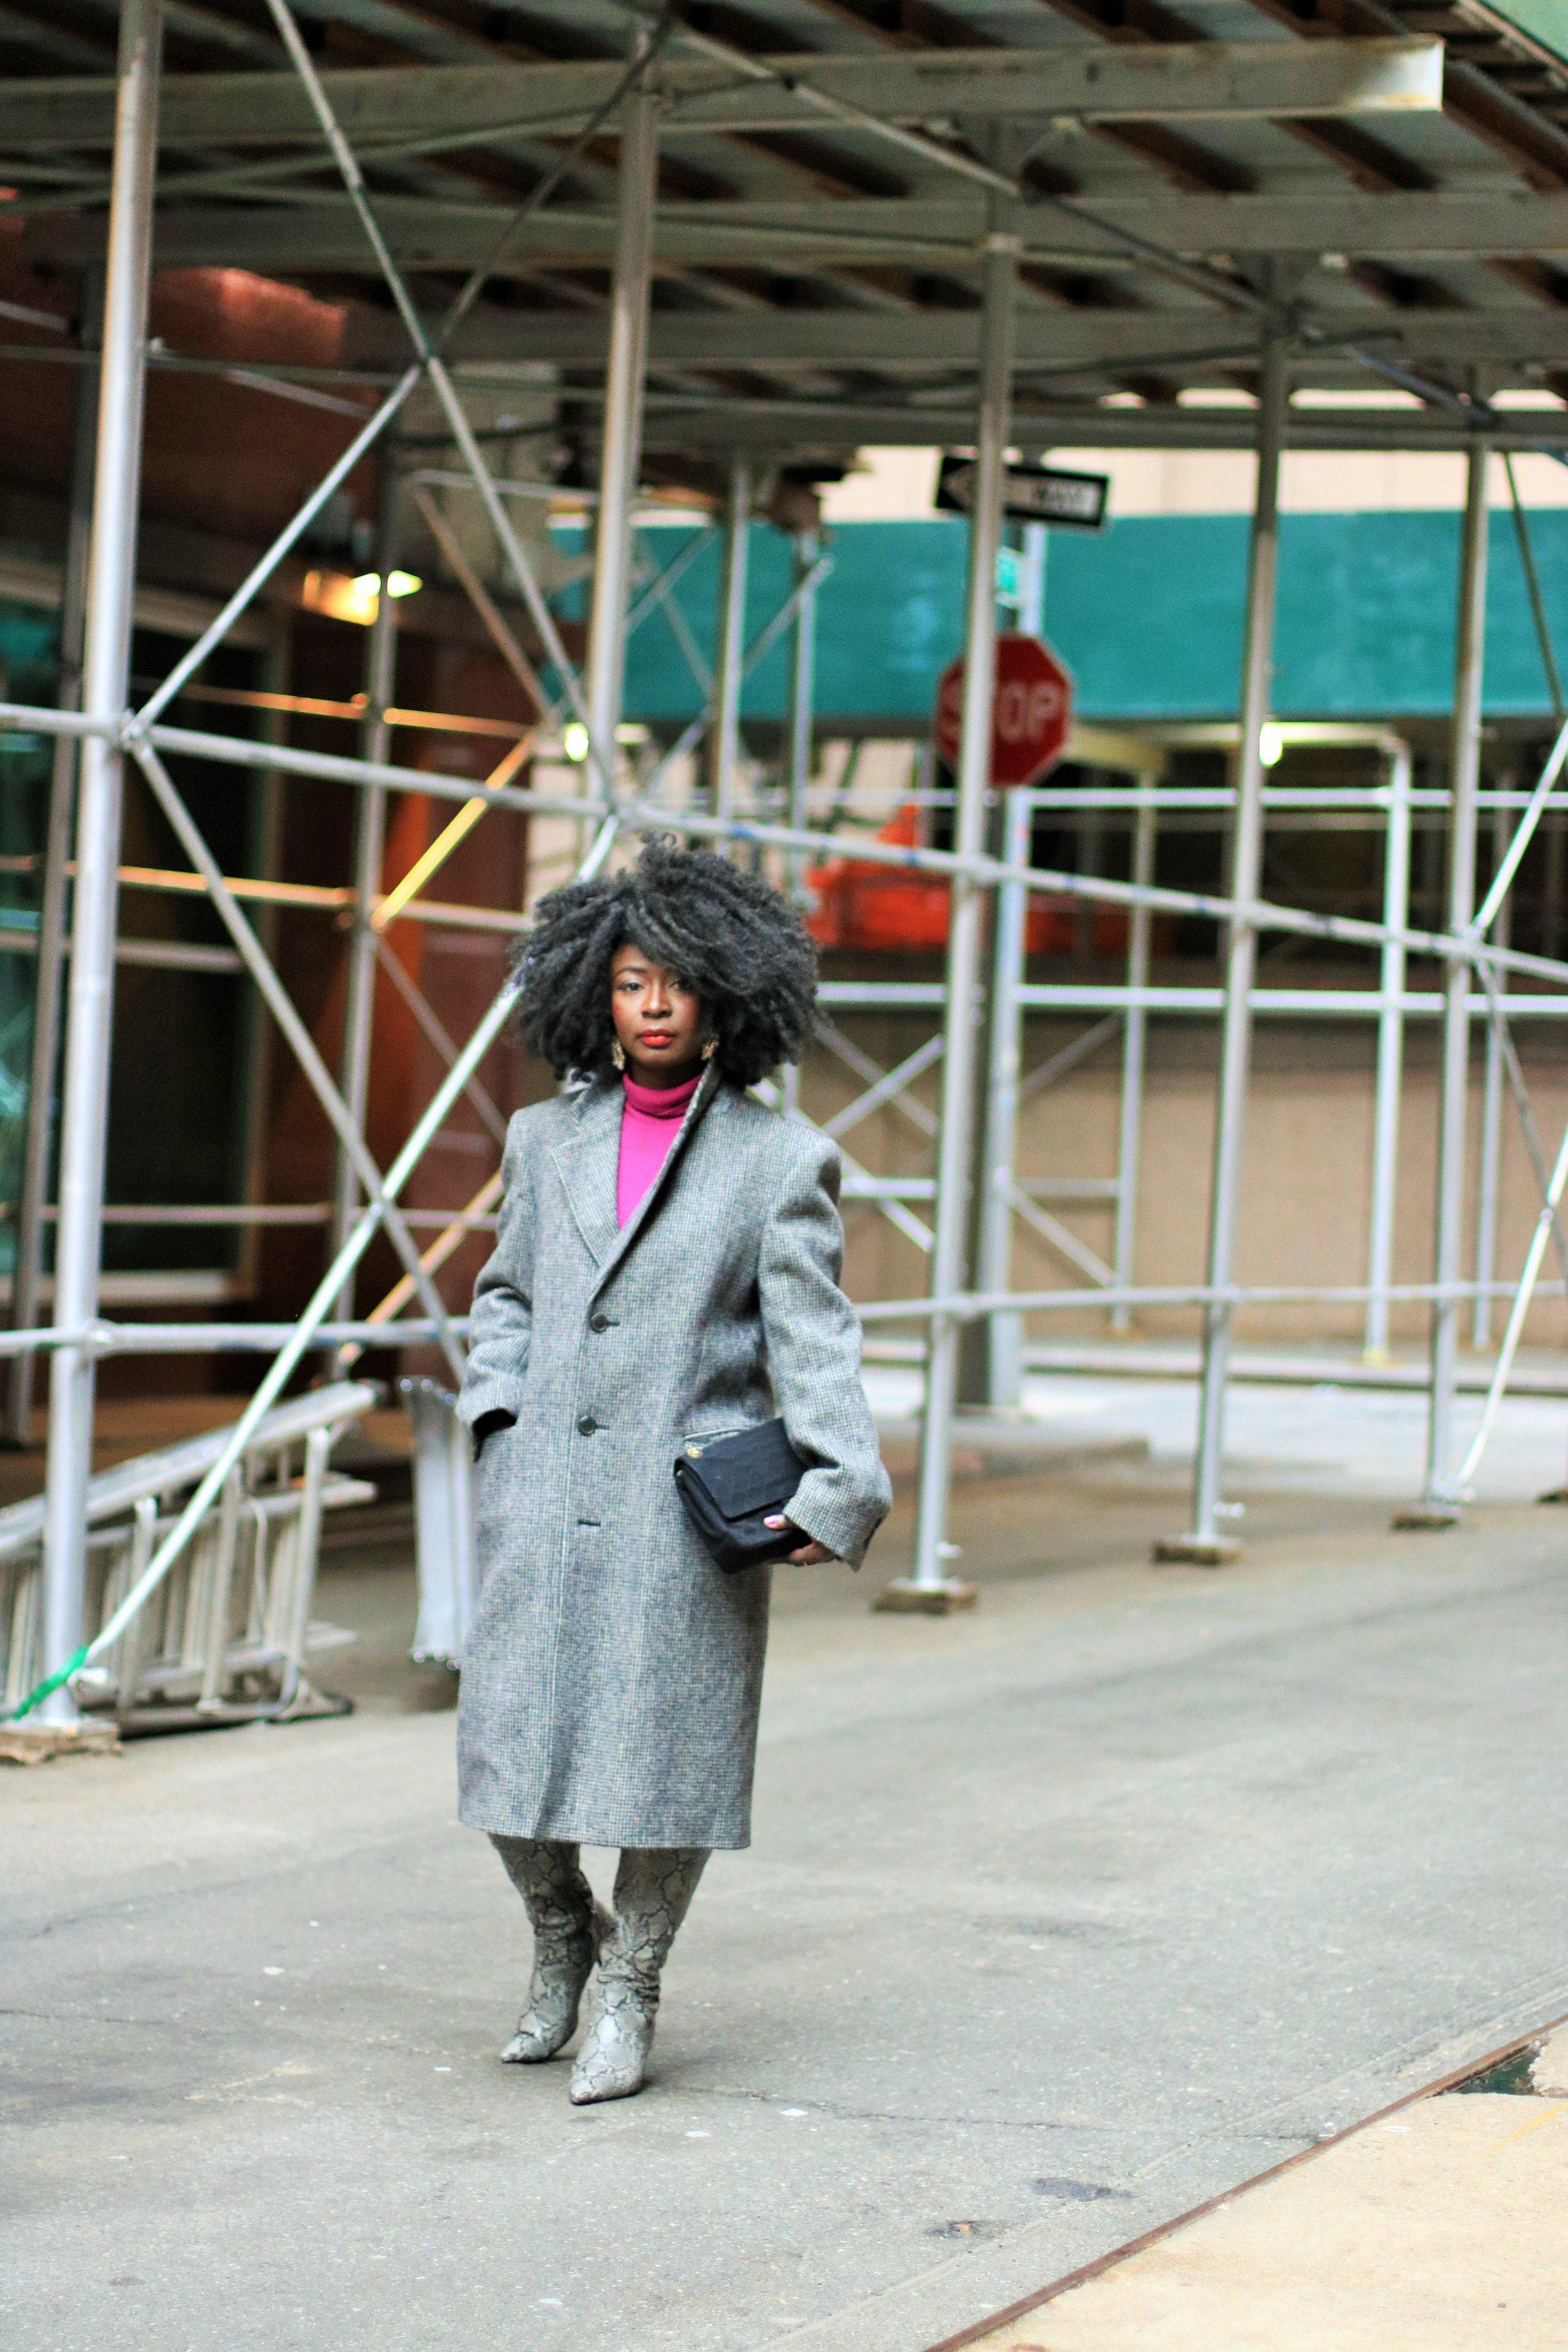 Menswear-inspired-plaid-coat-for-women